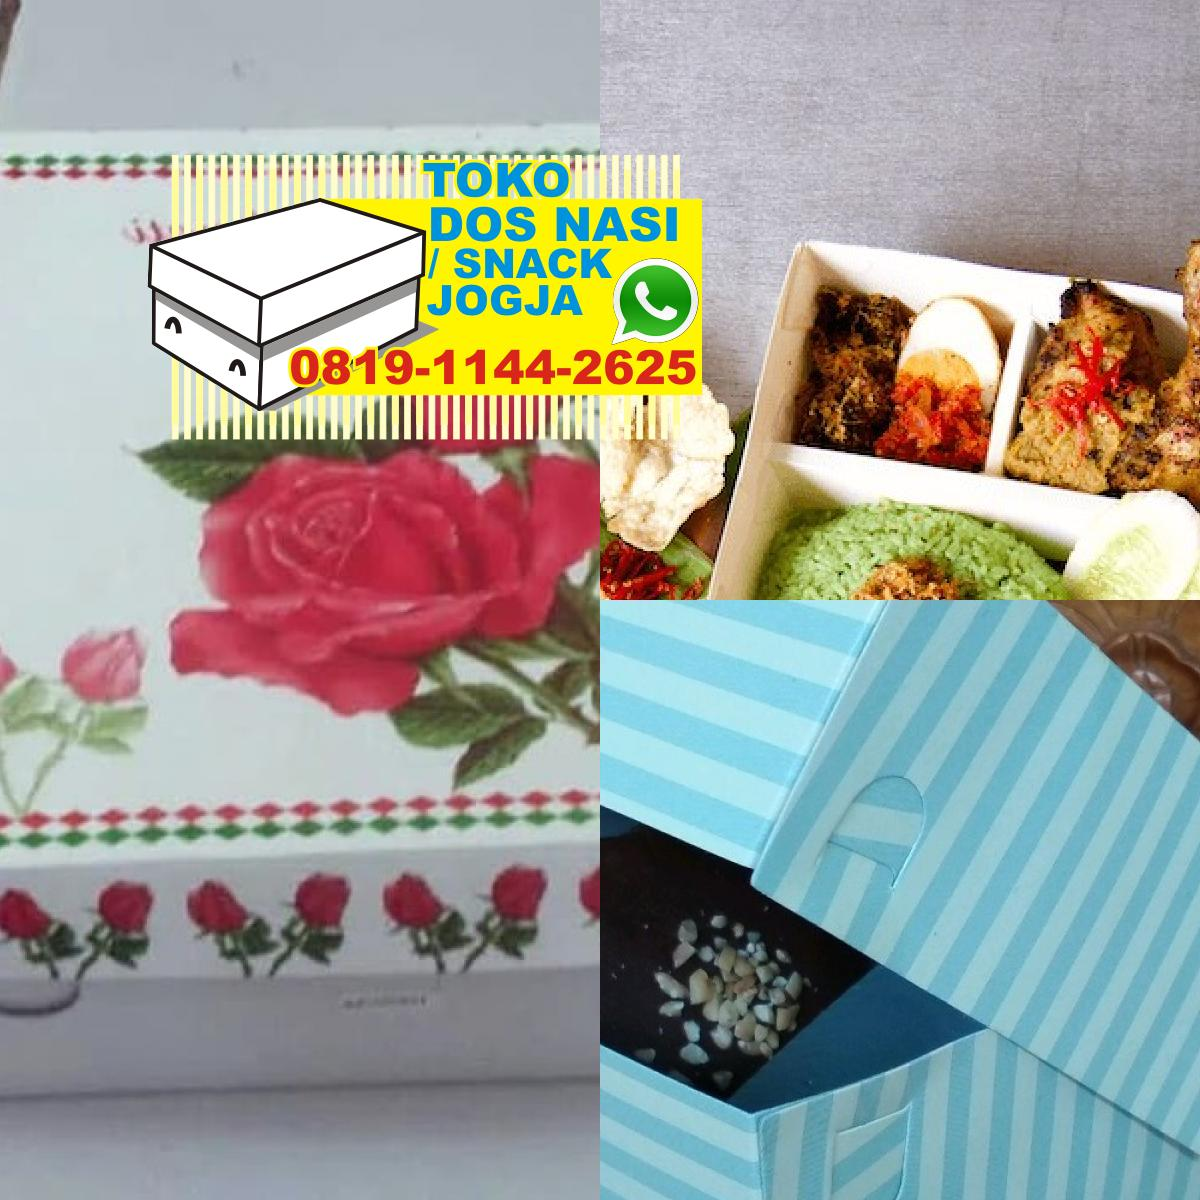 Pesanan Snack Box Jogja - 0819~1144~2625 (WA) desain kotak ...